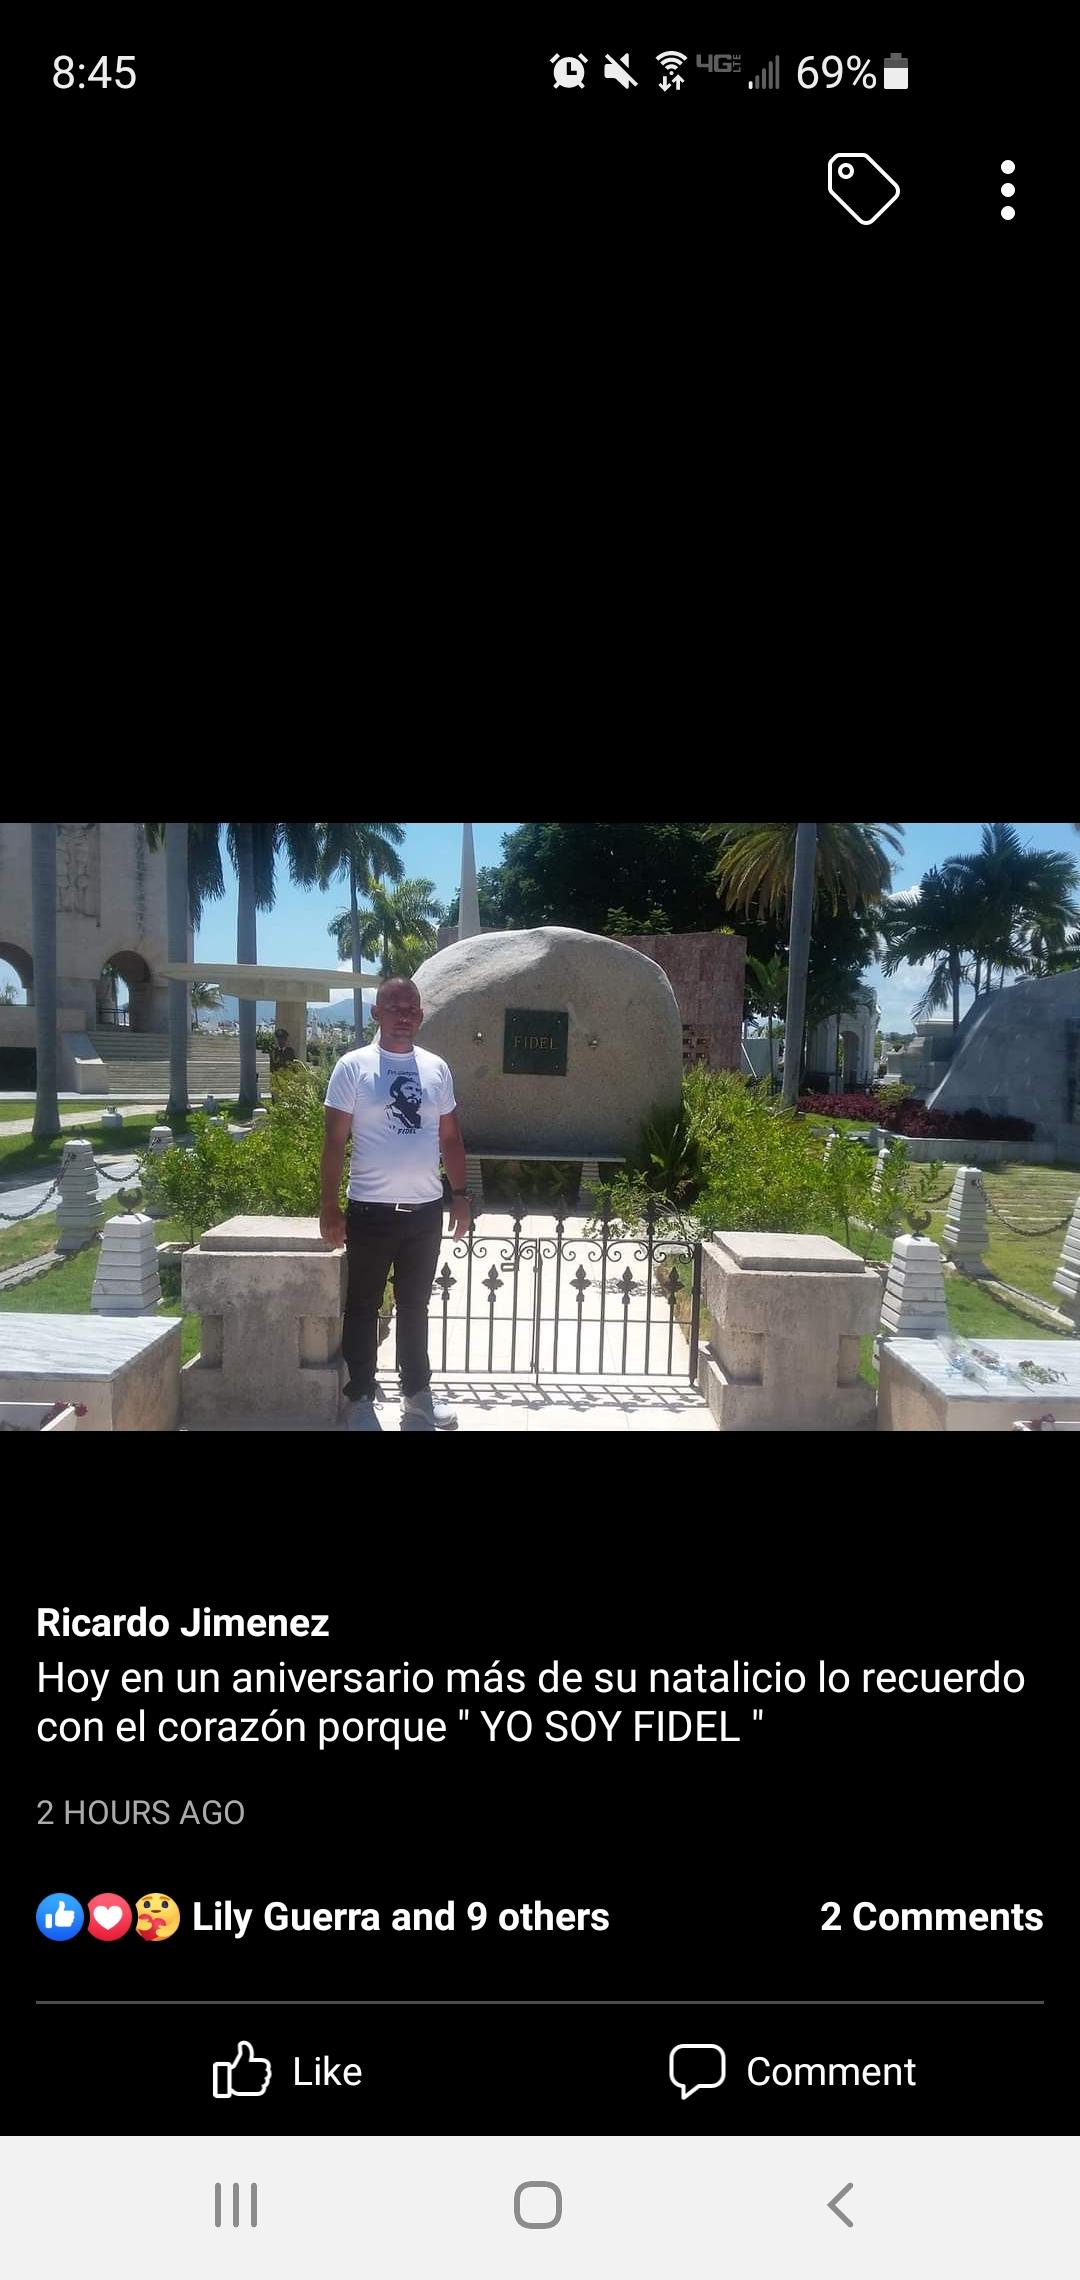 Ricardo Jimenez